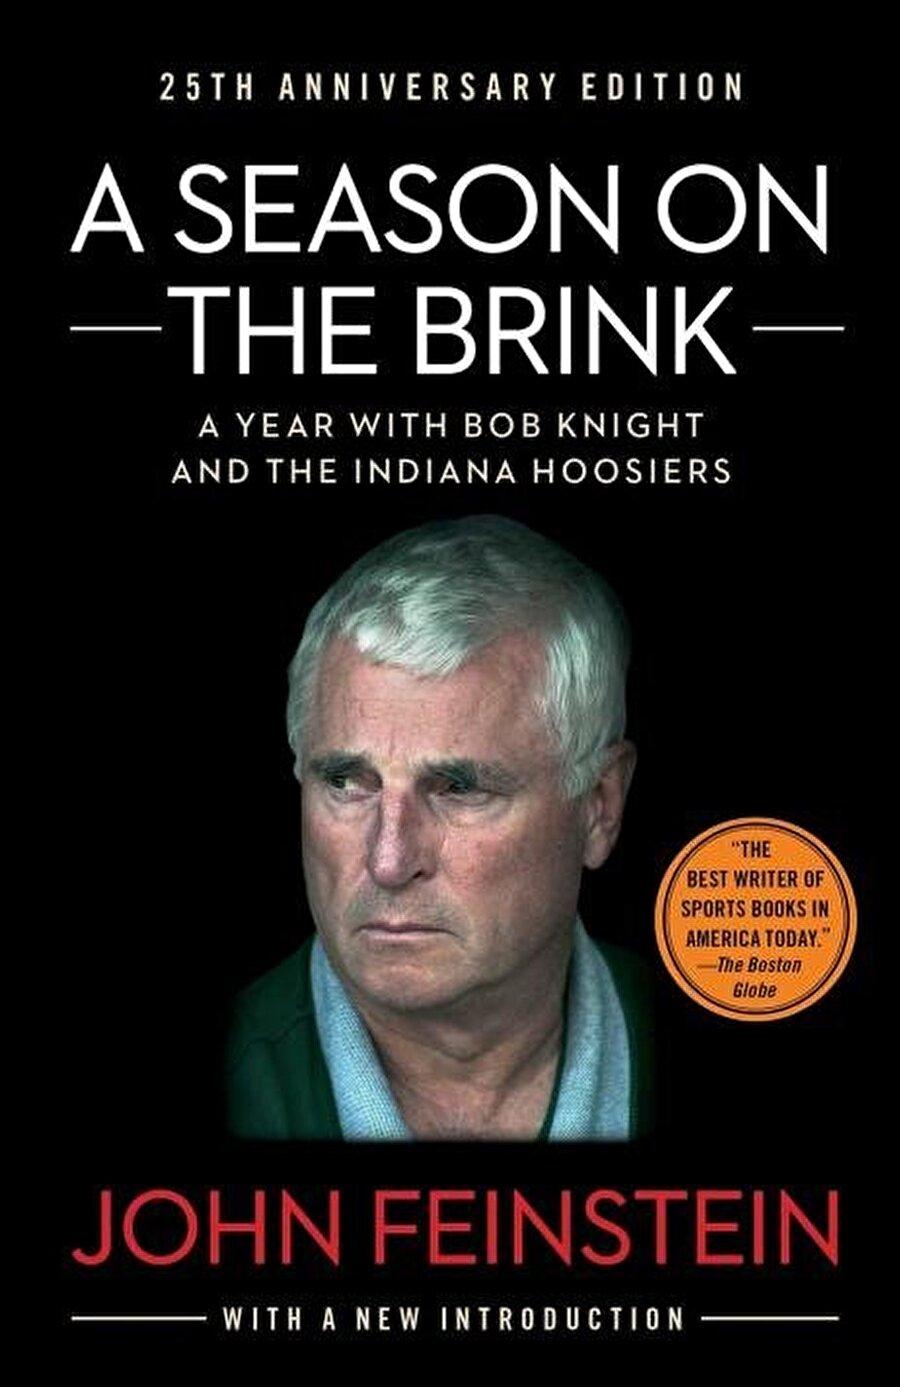 A SEASON ON THE BRINK: John Feinstein